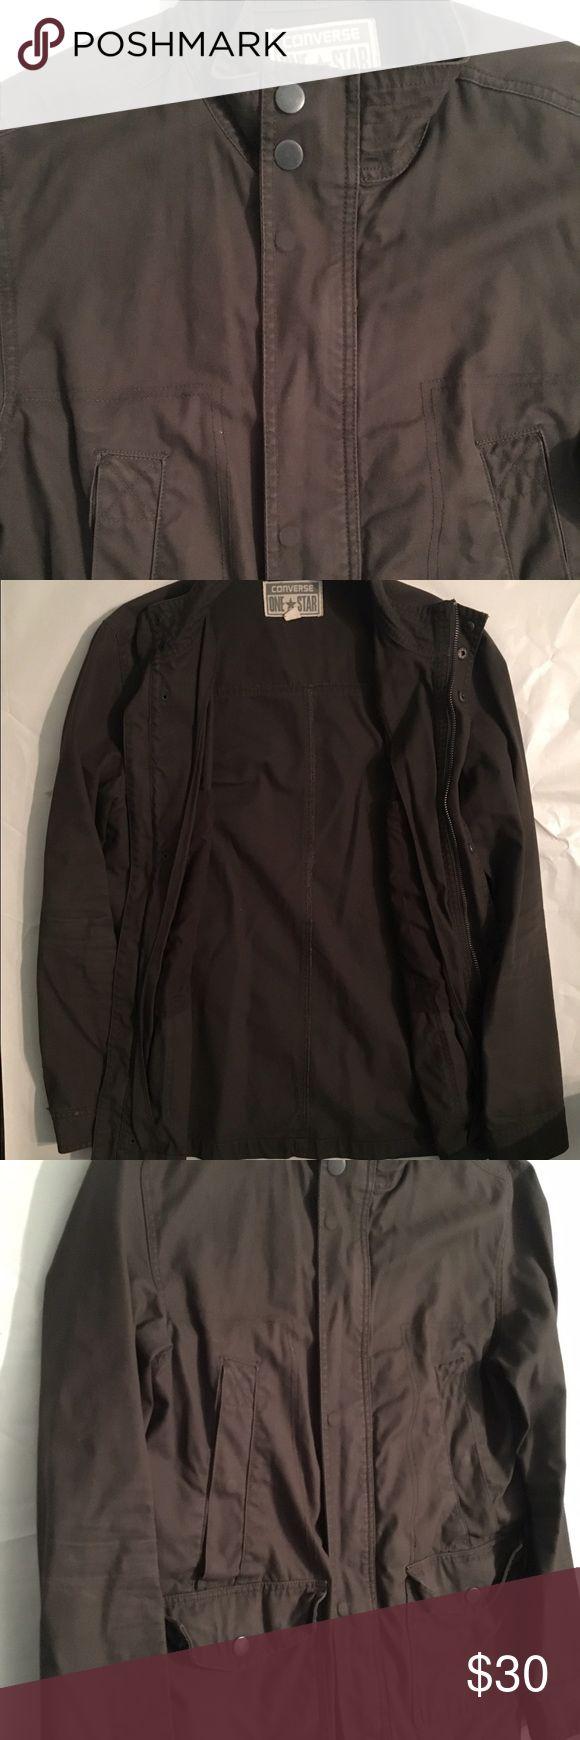 Classic Men's Converse Jacket Mint Condition Men's Converse Jacket.Chest Pockets. Size L Converse Jackets & Coats Military & Field